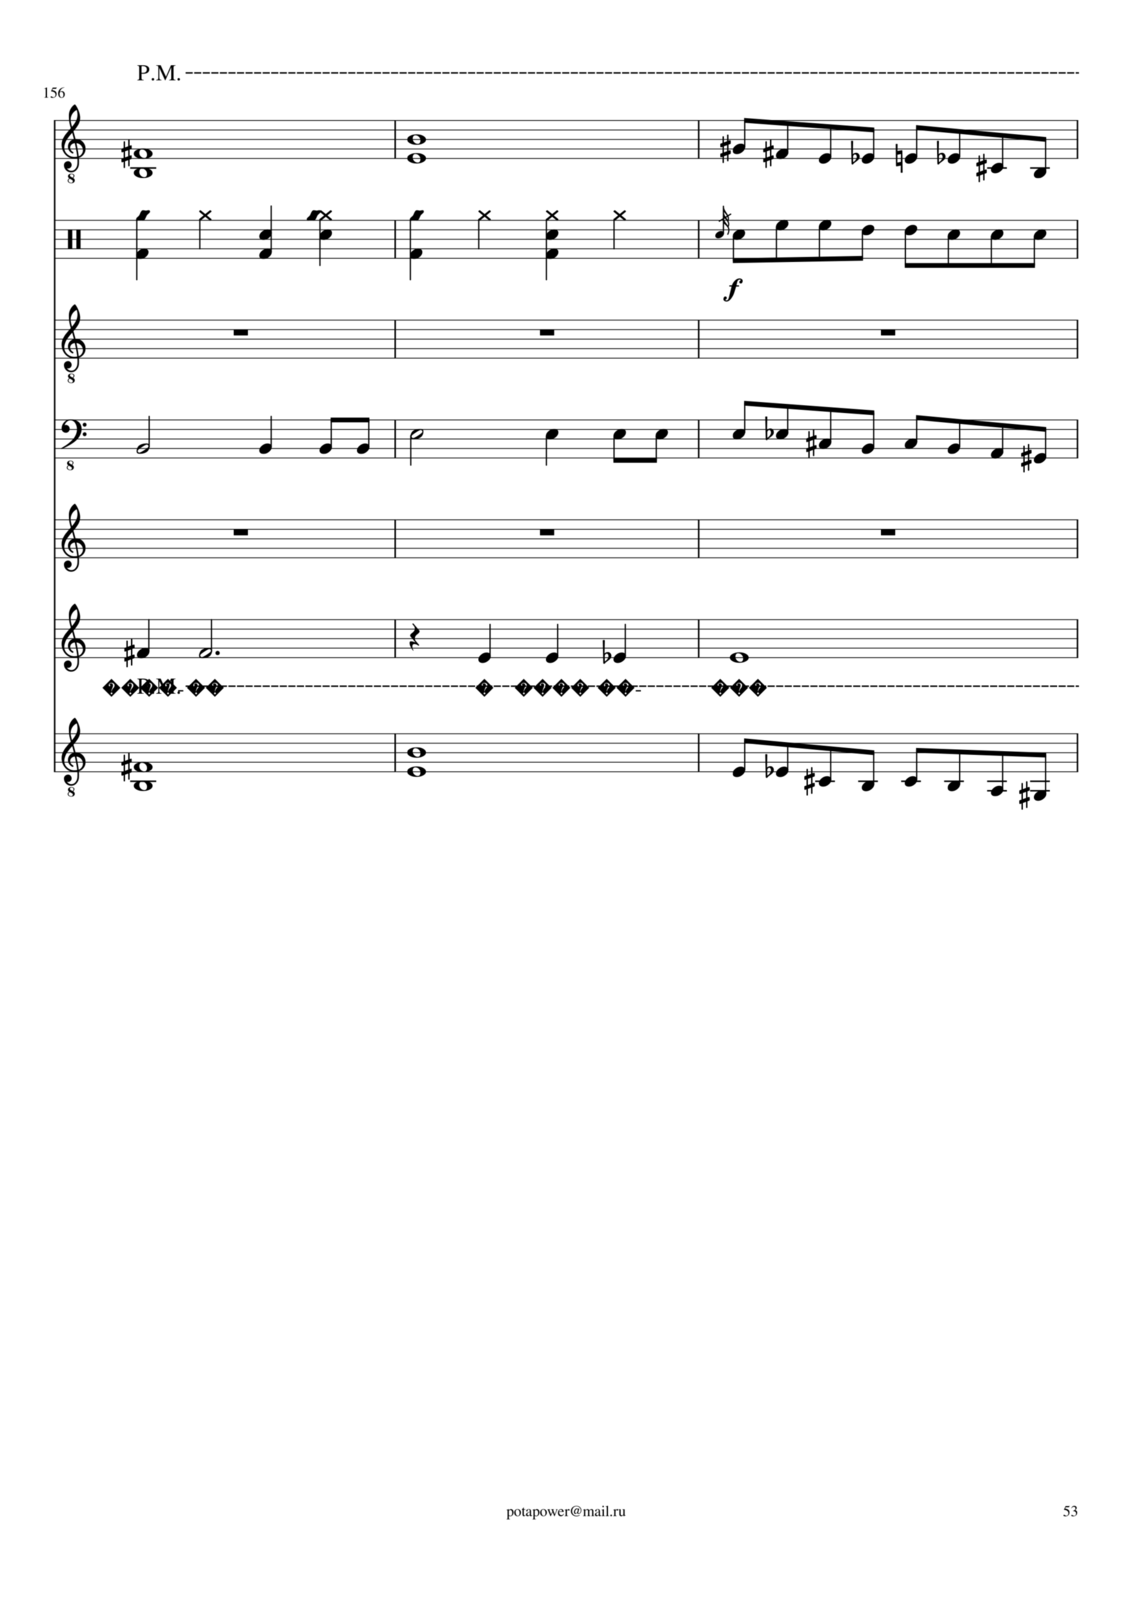 Ten lyubvi slide, Image 53